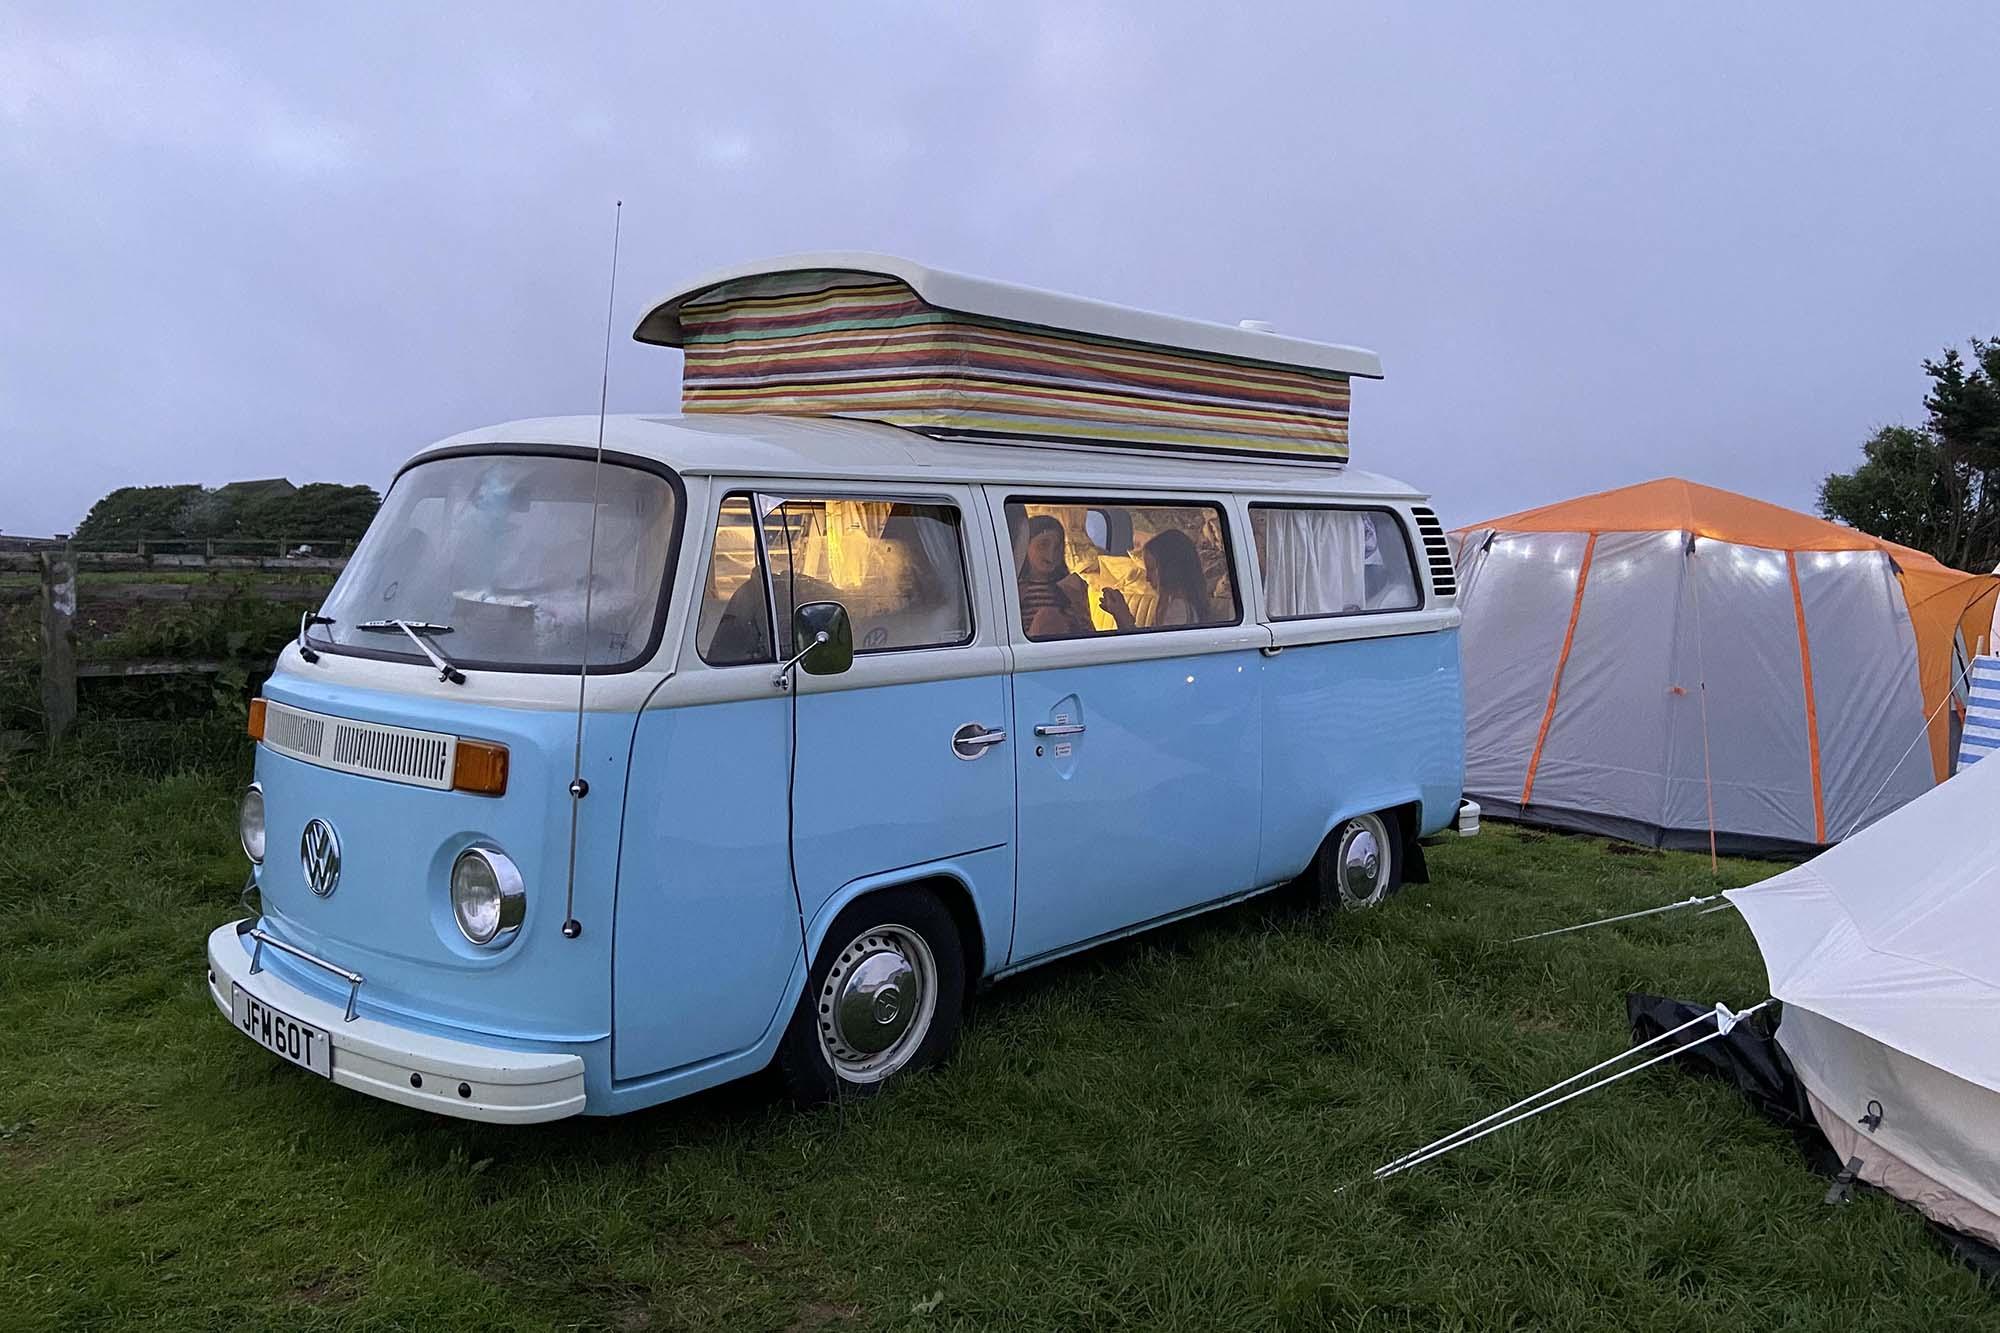 campervan bertie at dusk